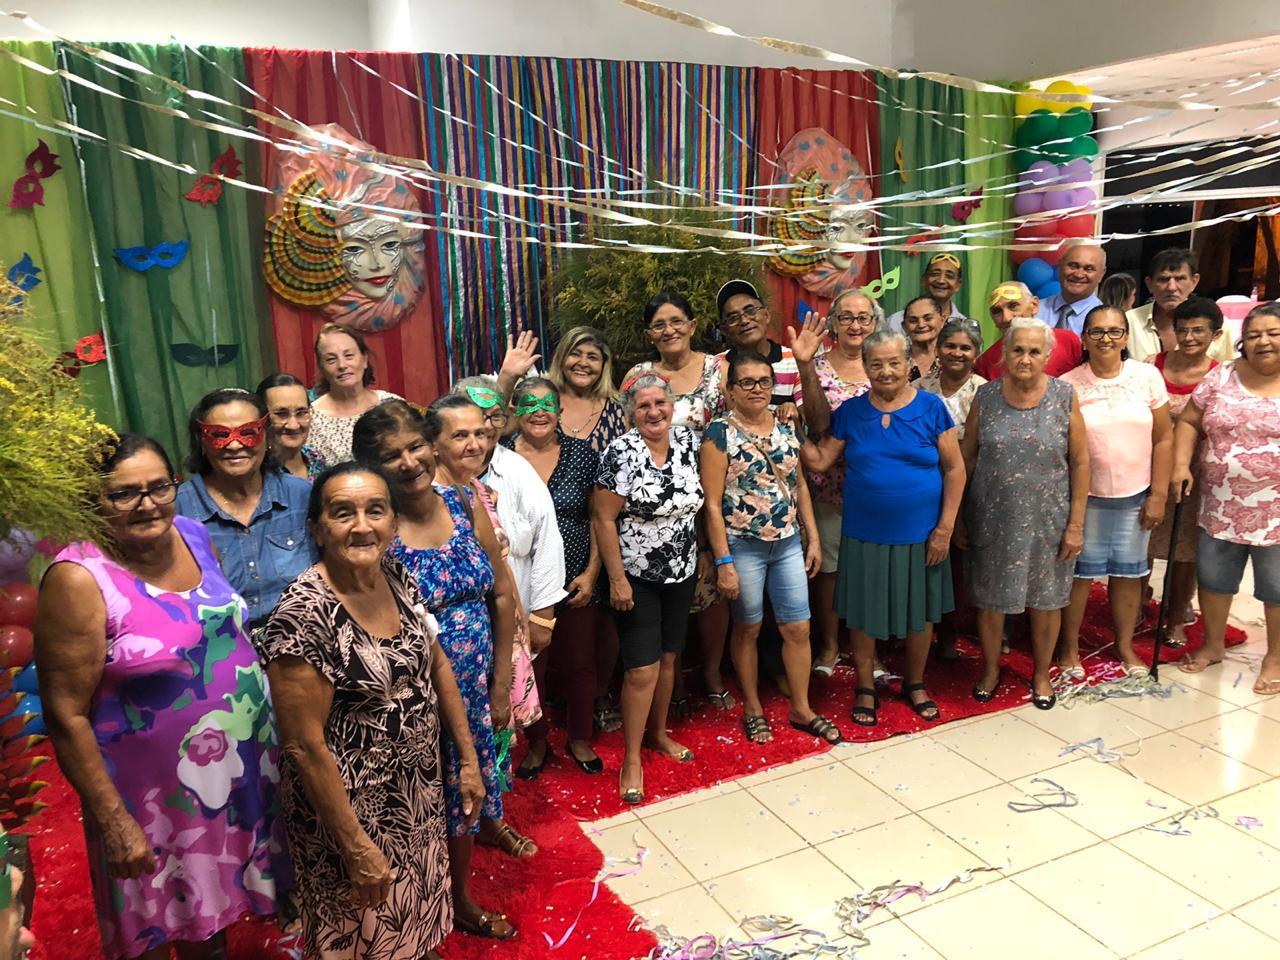 Prefeitura de Lagoa da Confusão realiza Baile de Máscaras para idosos atendidos pelo CRAS